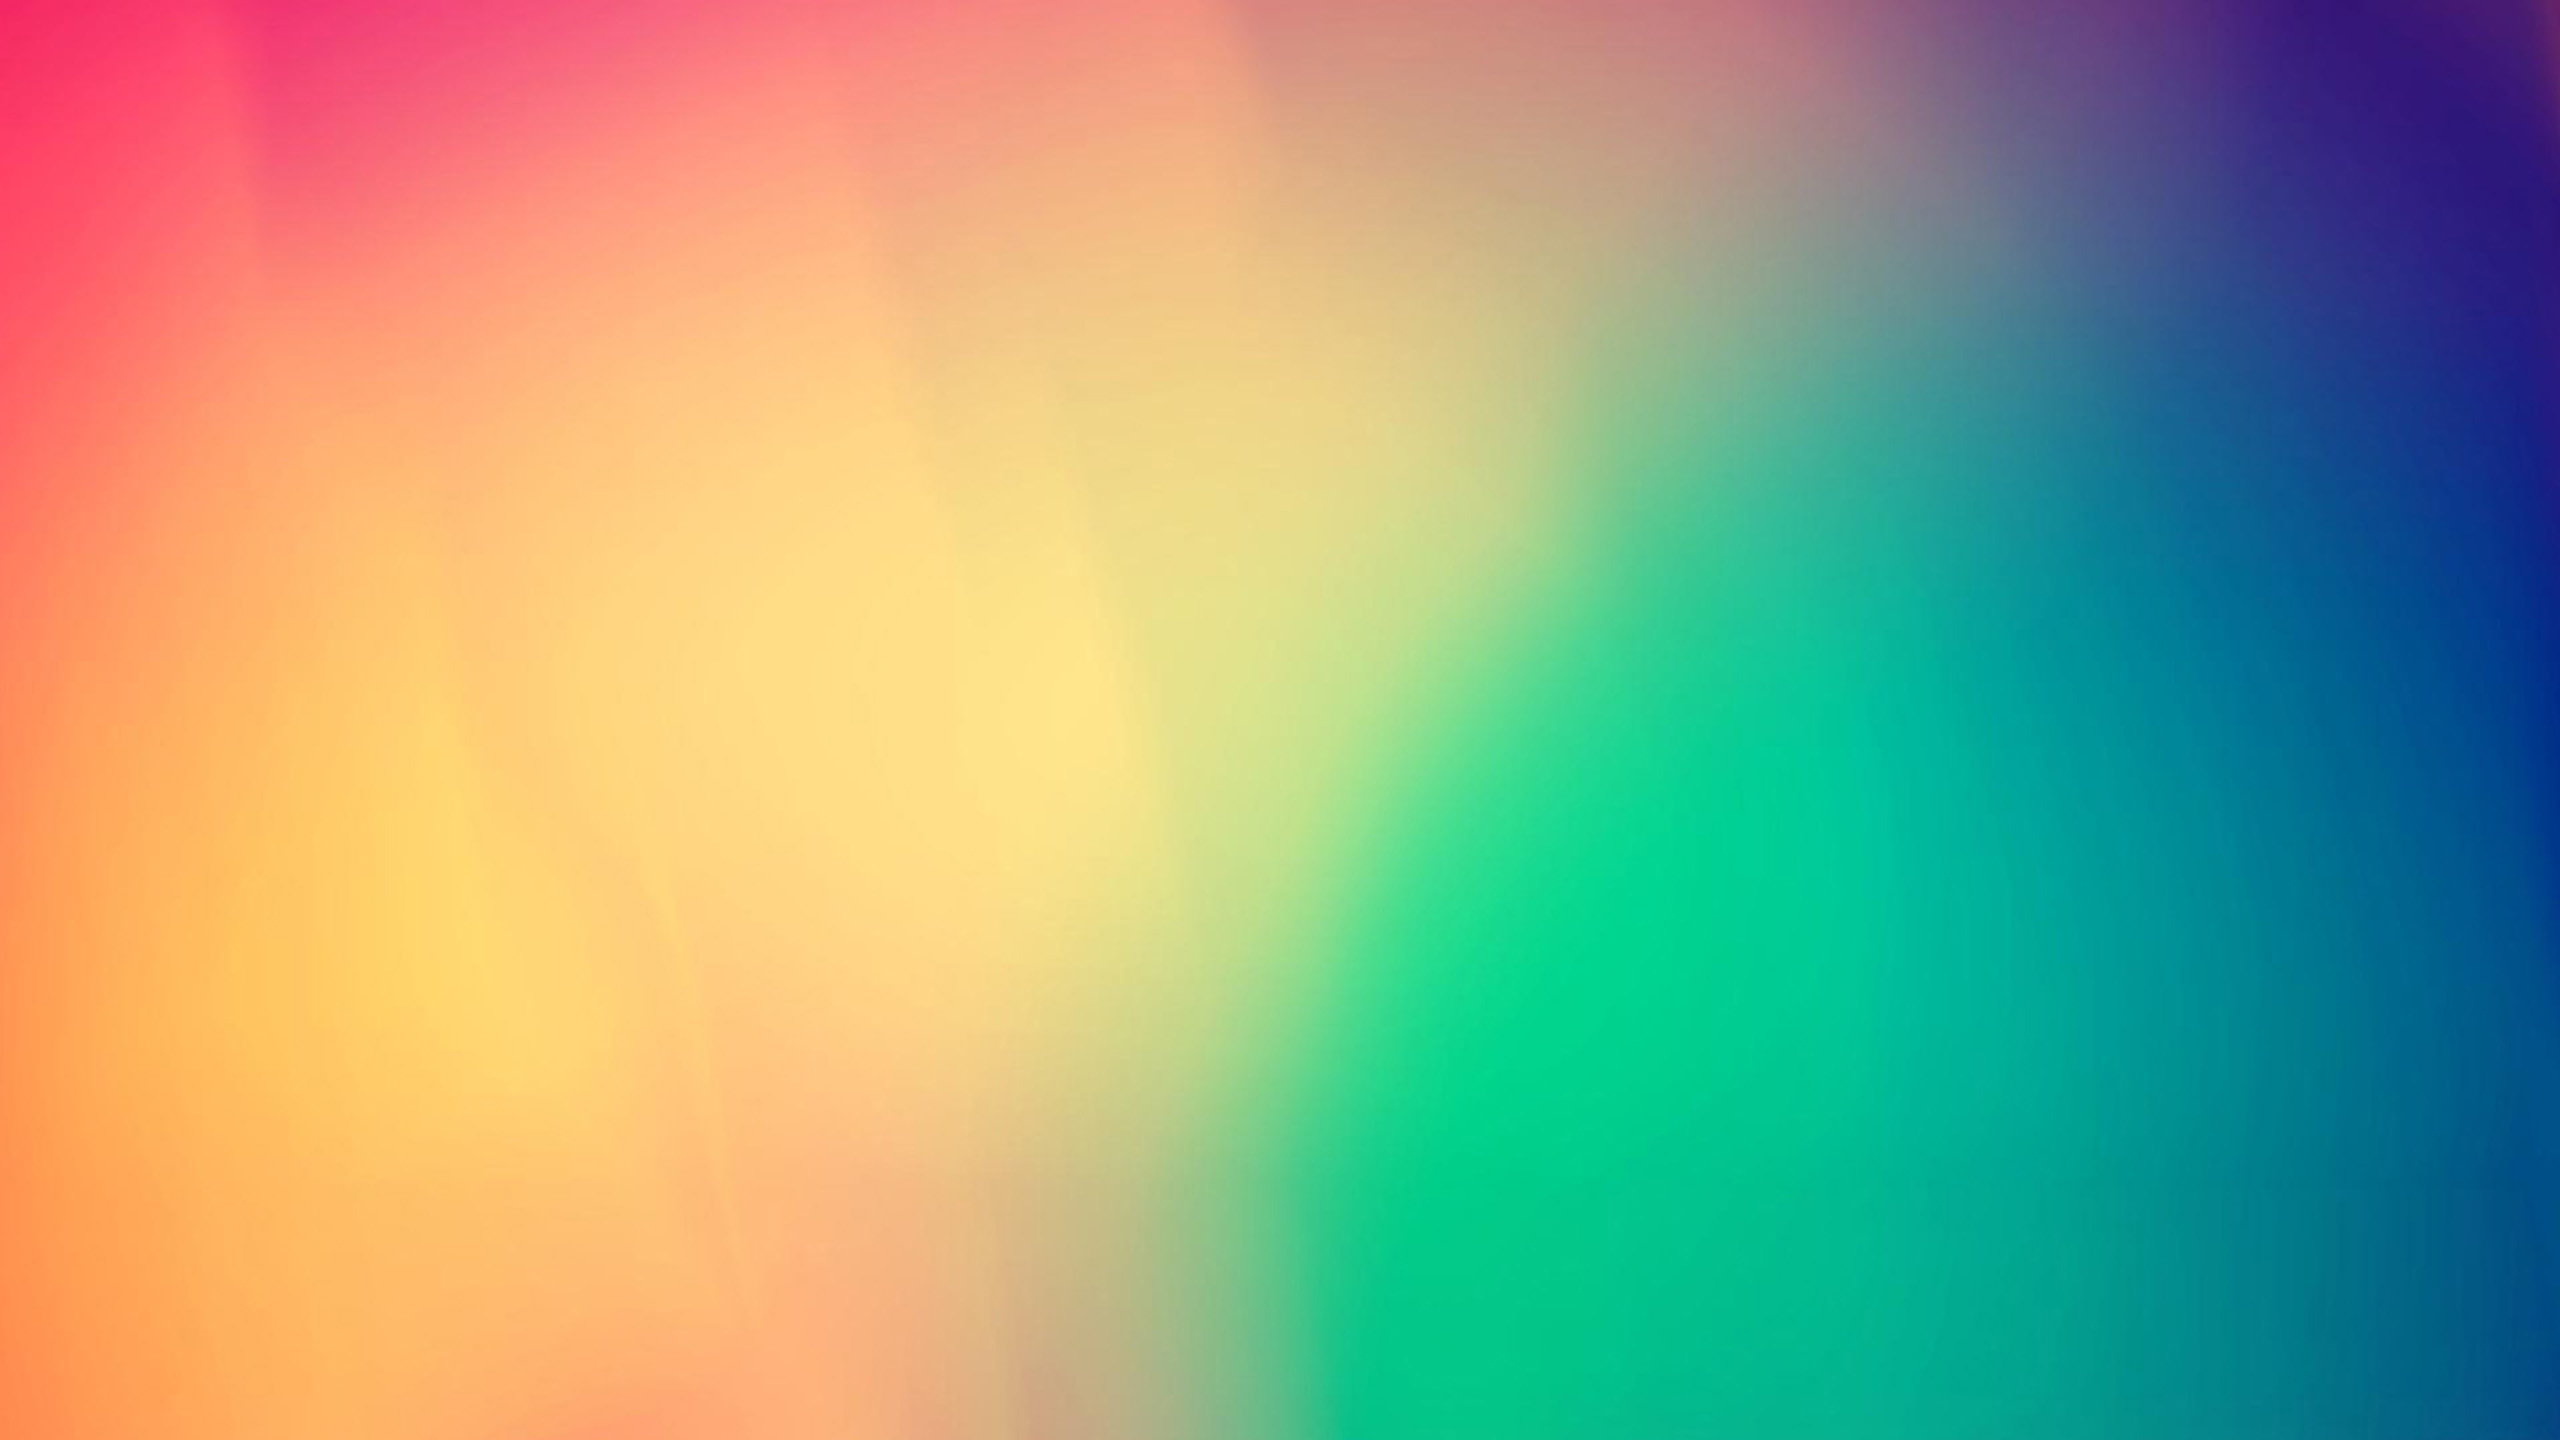 Free Download 3d Desktop Wallpapers Backgrounds Solid Color Backgrounds Pixelstalk Net